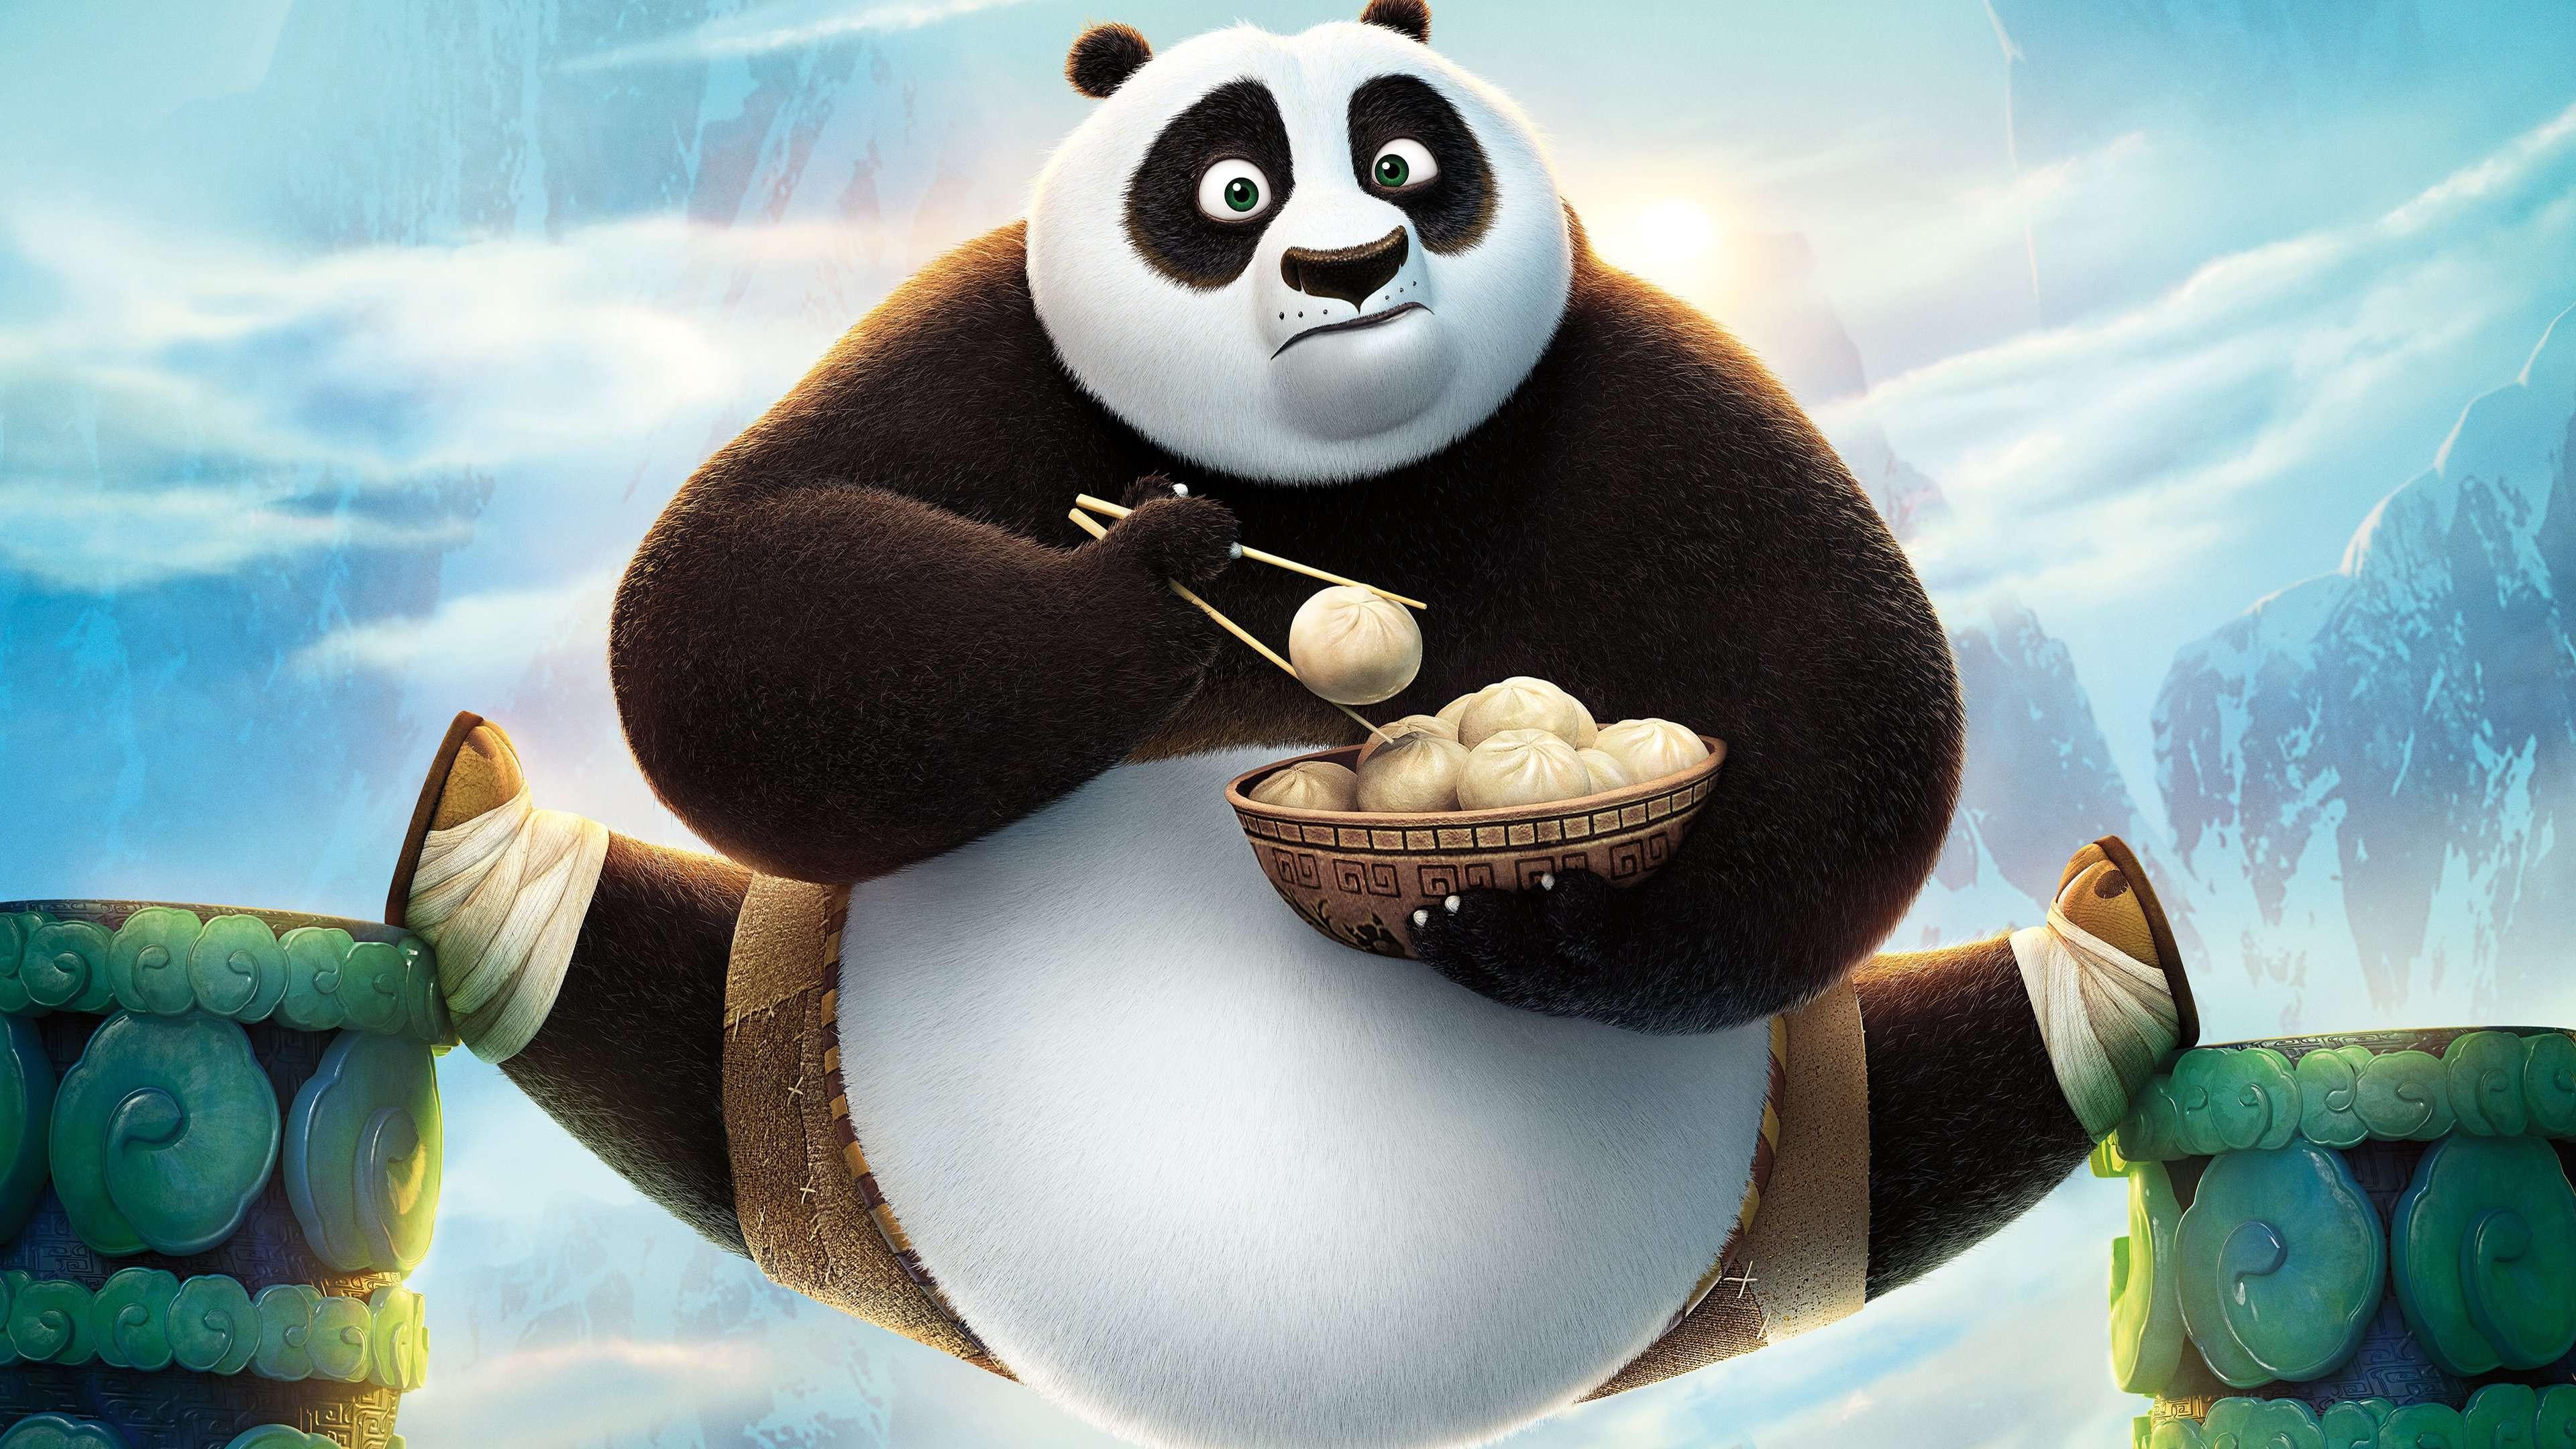 Wallpaper kung fu panda 3 best animation movies cartoon for Wallpaper home film